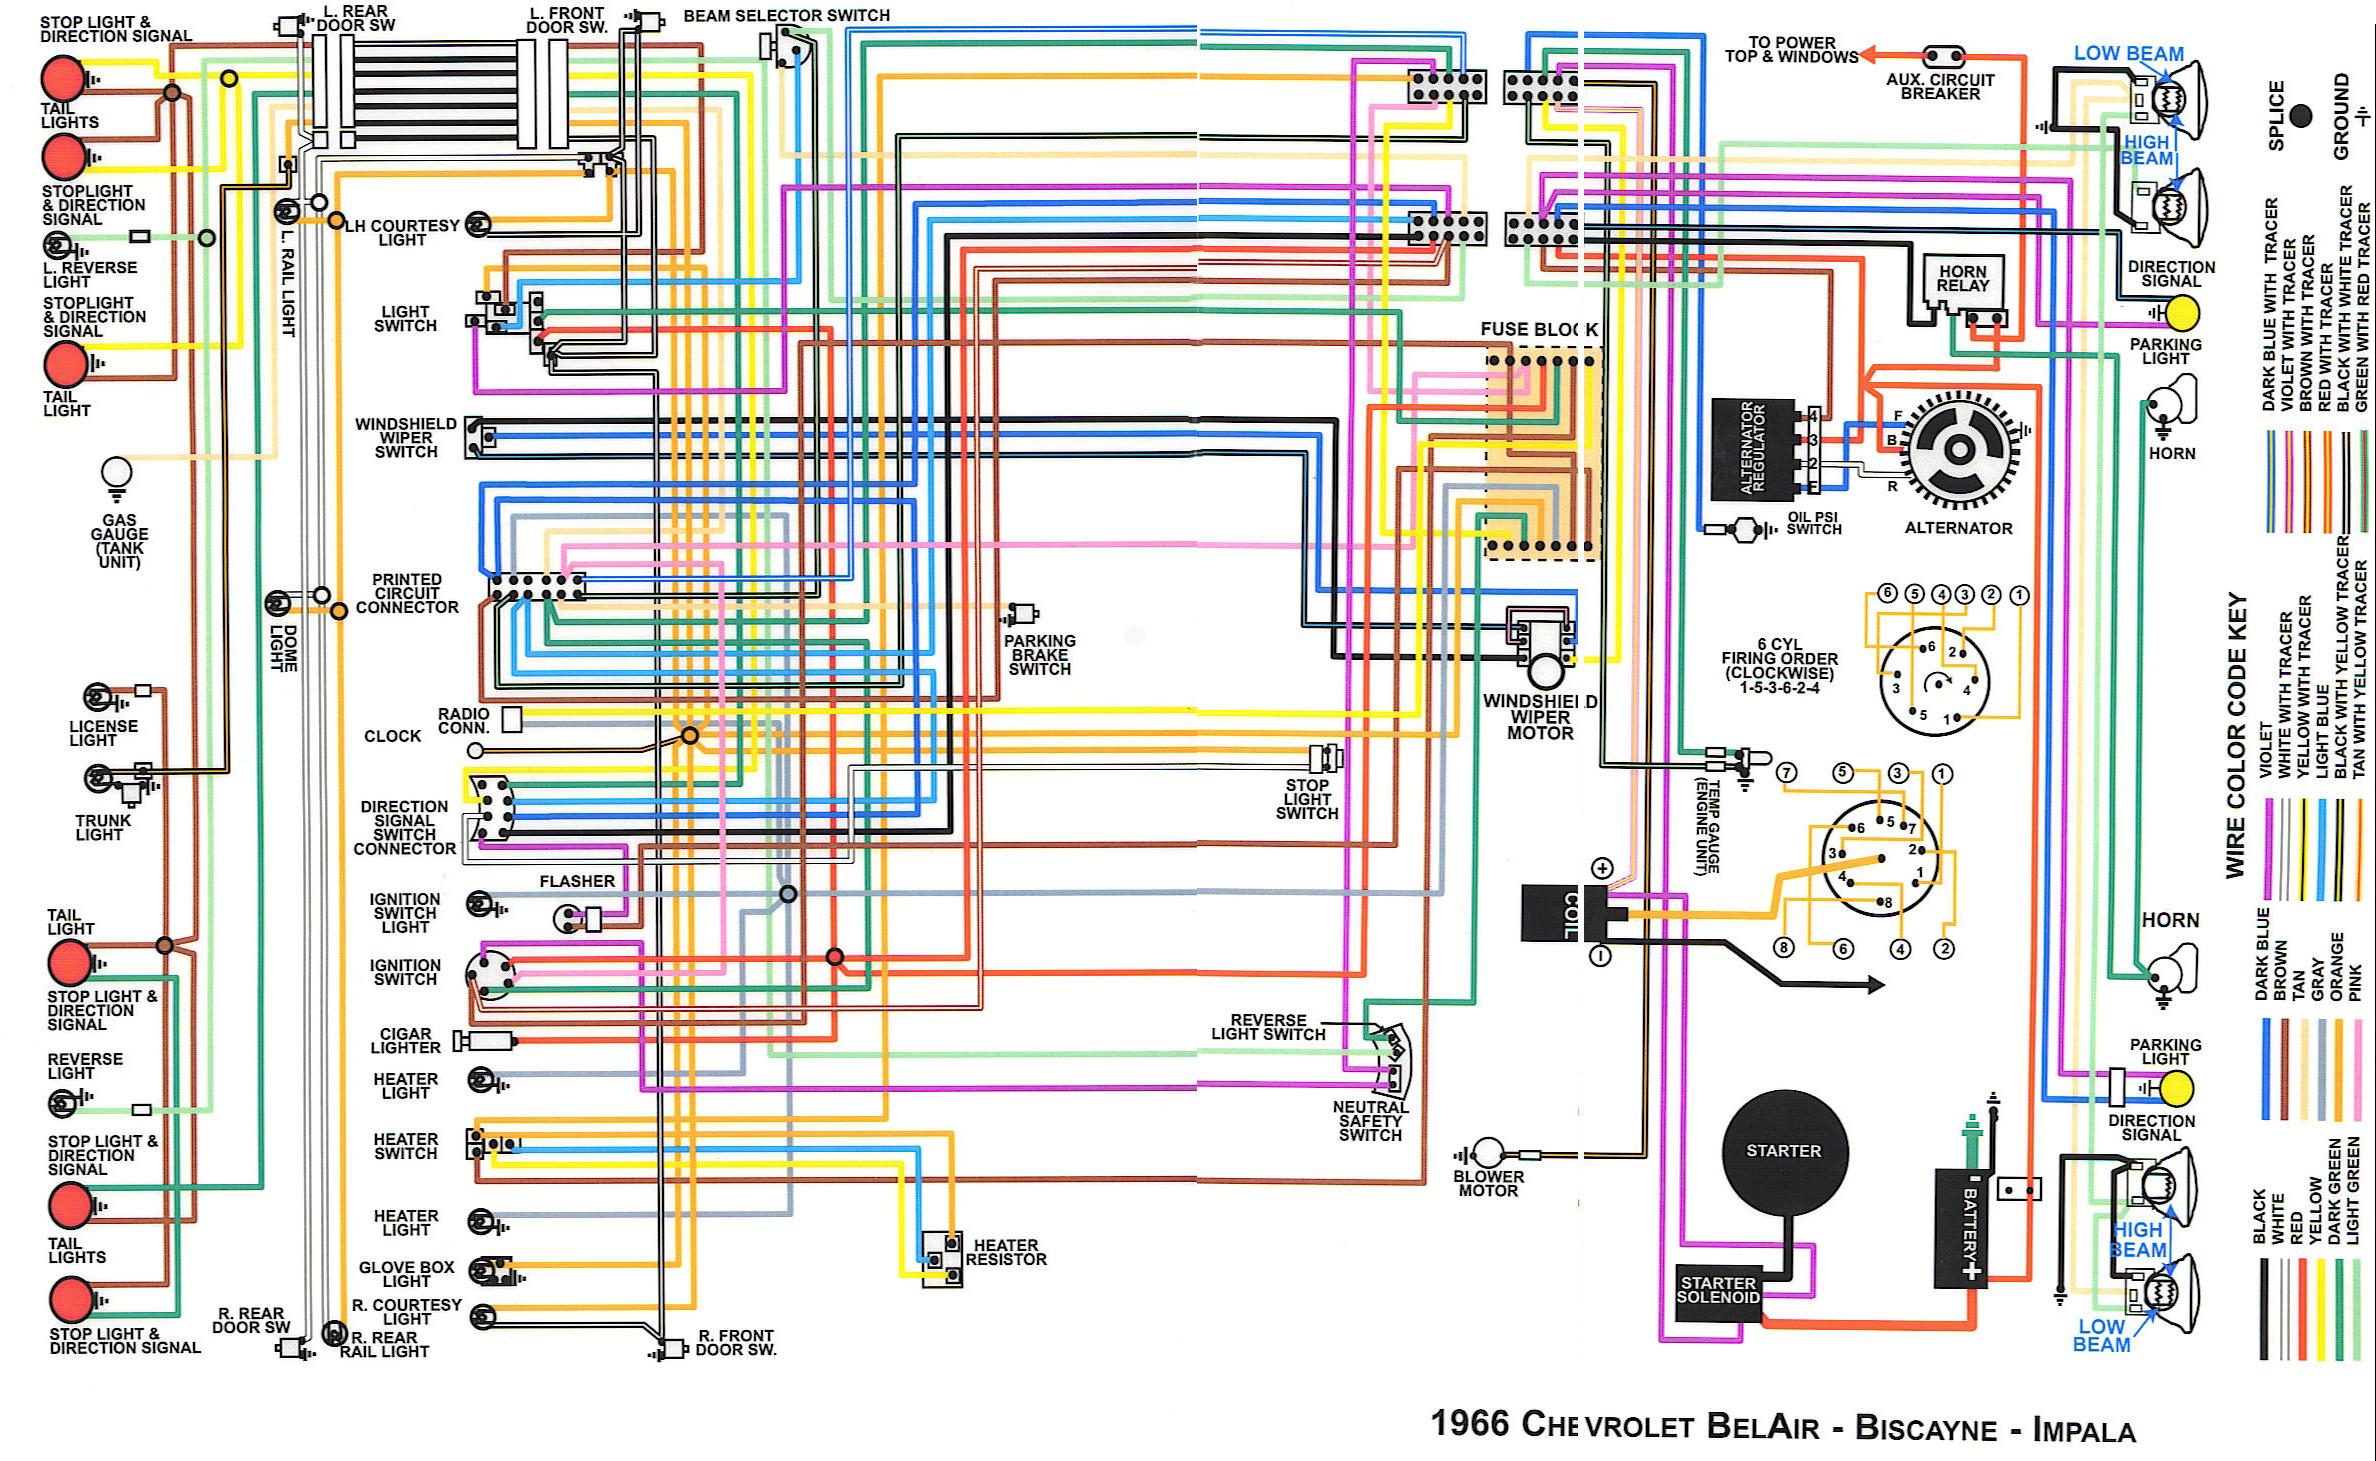 sh_9565] 1964 nova starter wiring diagram schematic wiring  trua flui denli botse terch elae hroni xeira mohammedshrine librar wiring  101